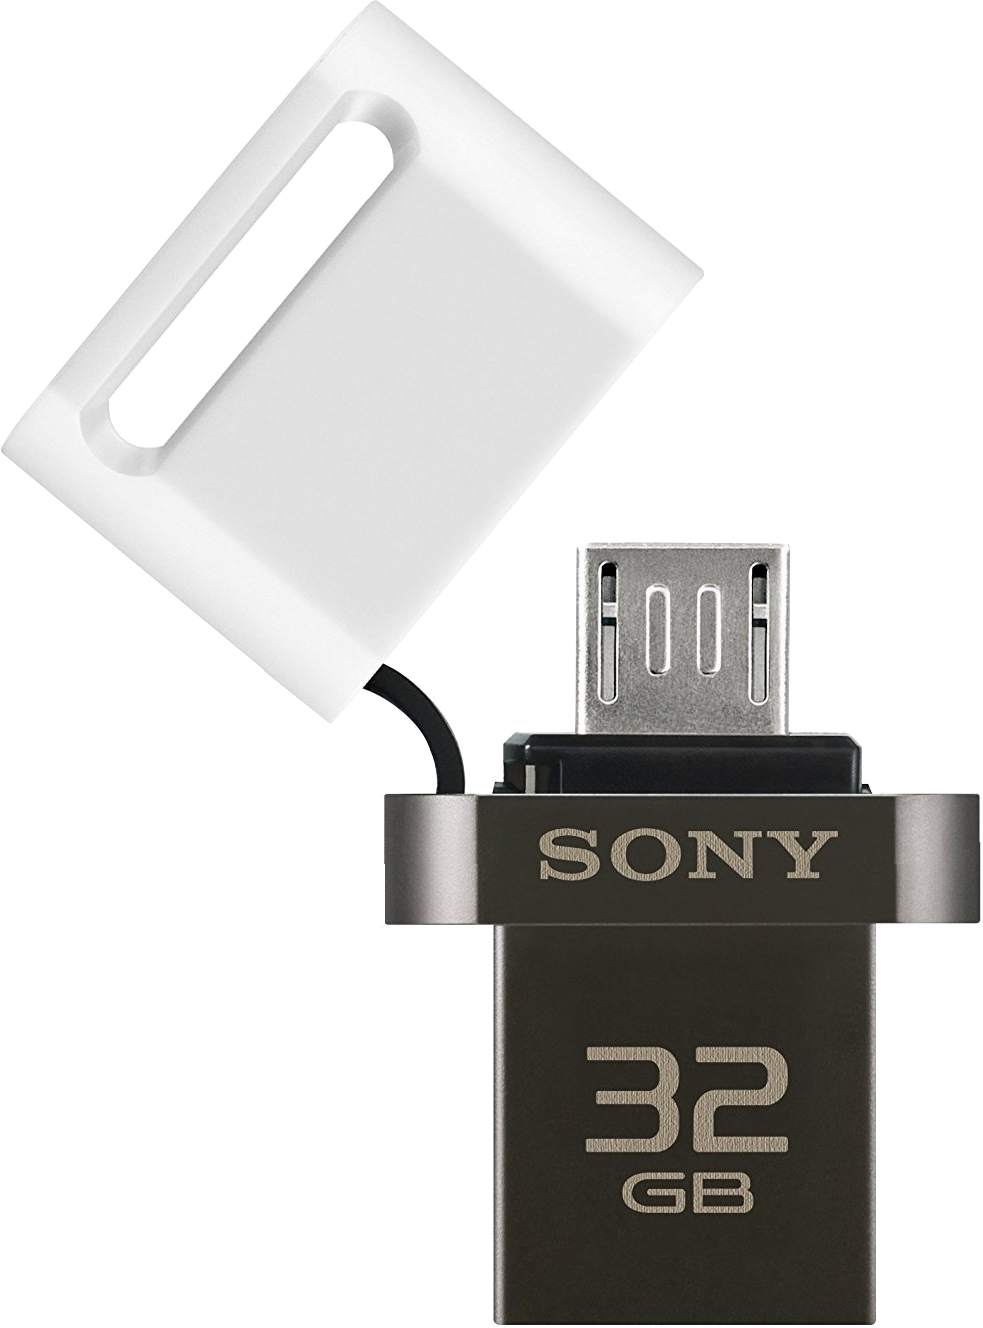 sony microvault usm32sa3 usb flash laufwerk 32 gb. Black Bedroom Furniture Sets. Home Design Ideas